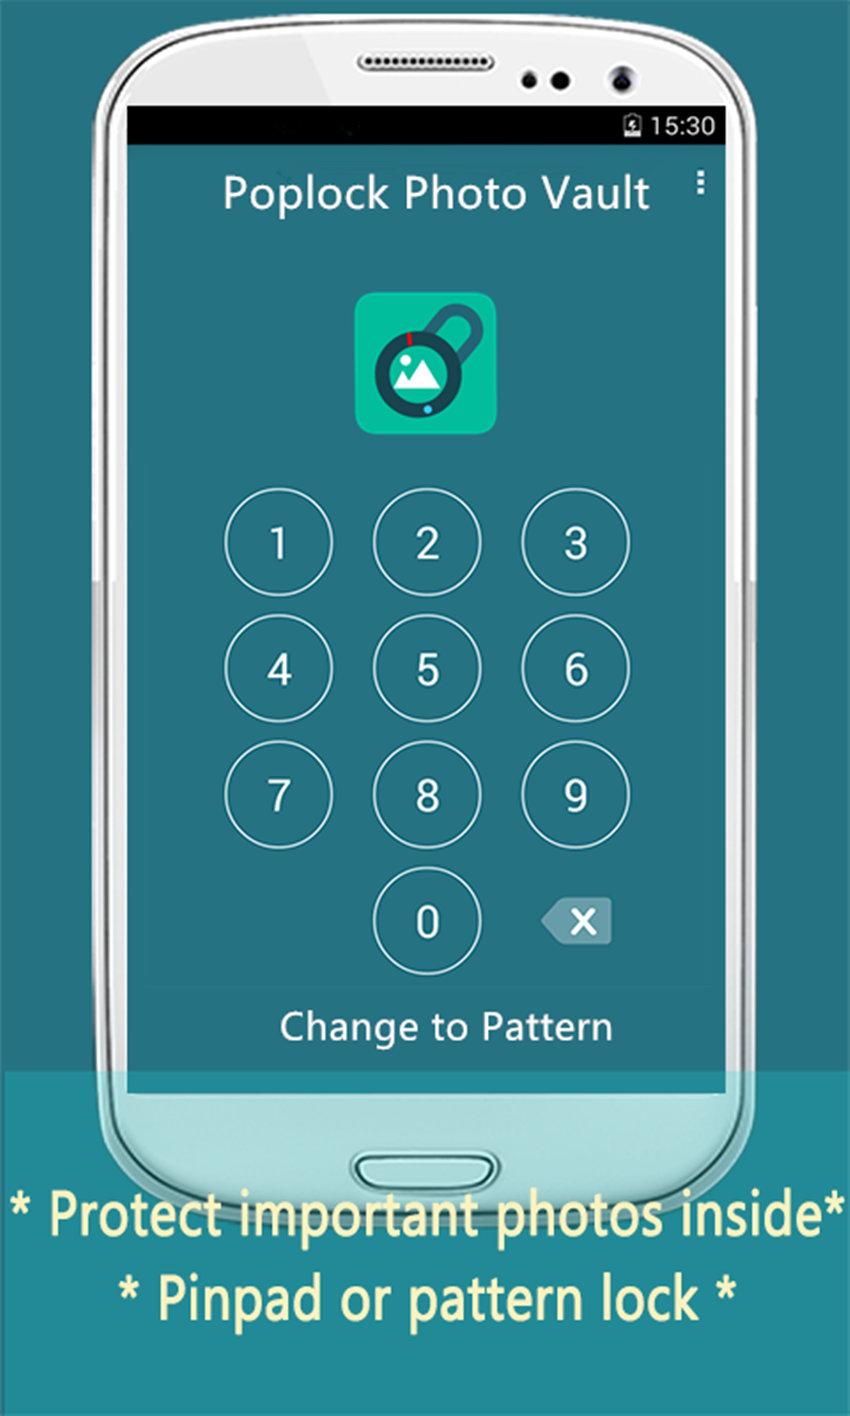 Poplock Photo Vault Pro Screenshot 3